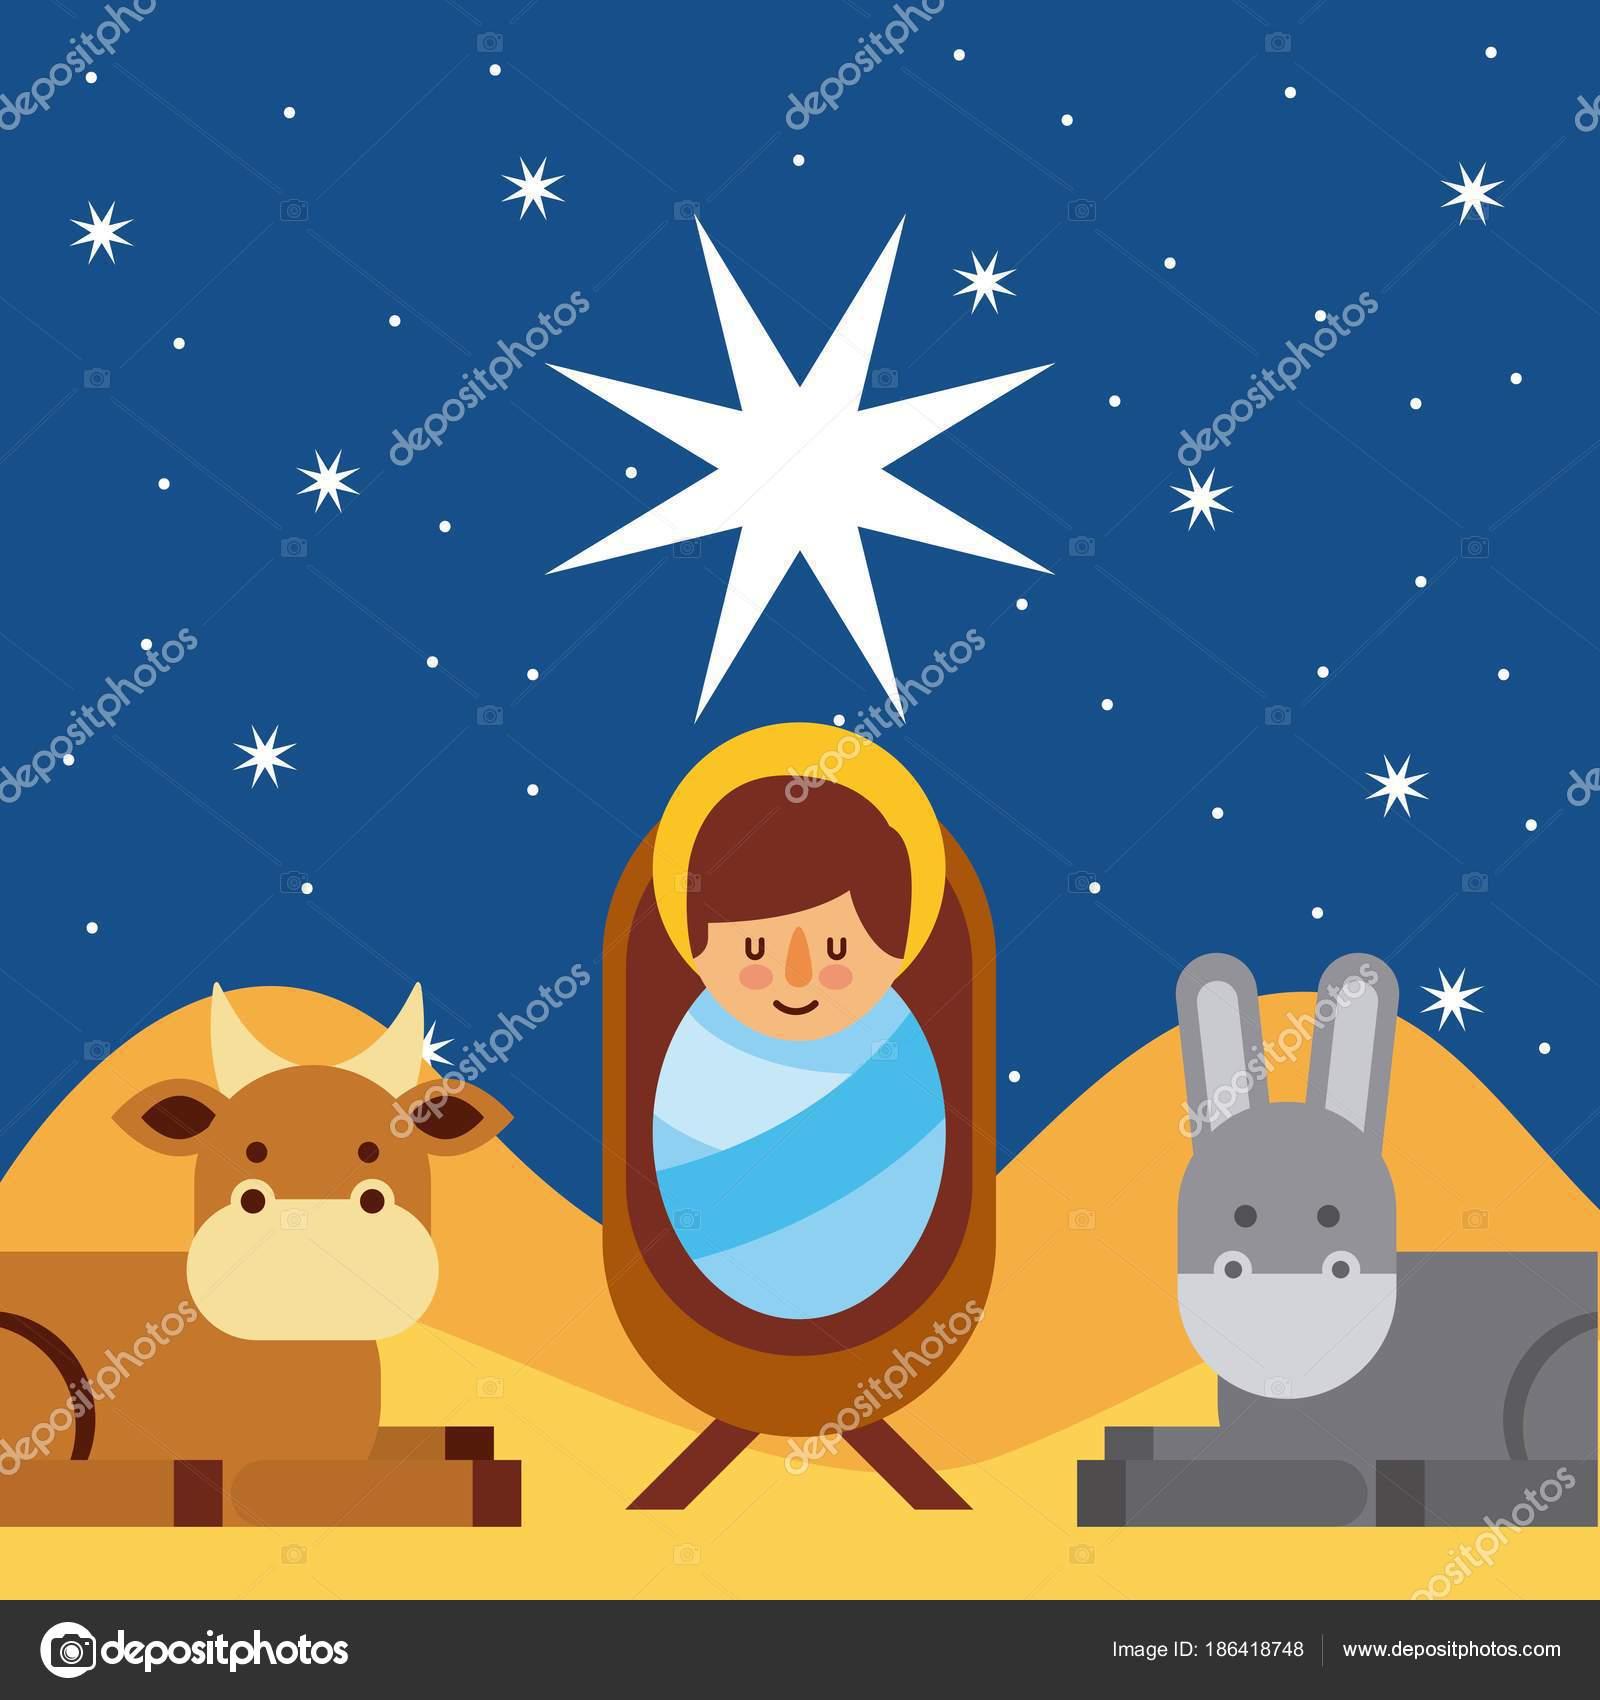 Frohe Weihnachten Jesus.Frohe Weihnachten Jesus Christus Heilig Gesegnet